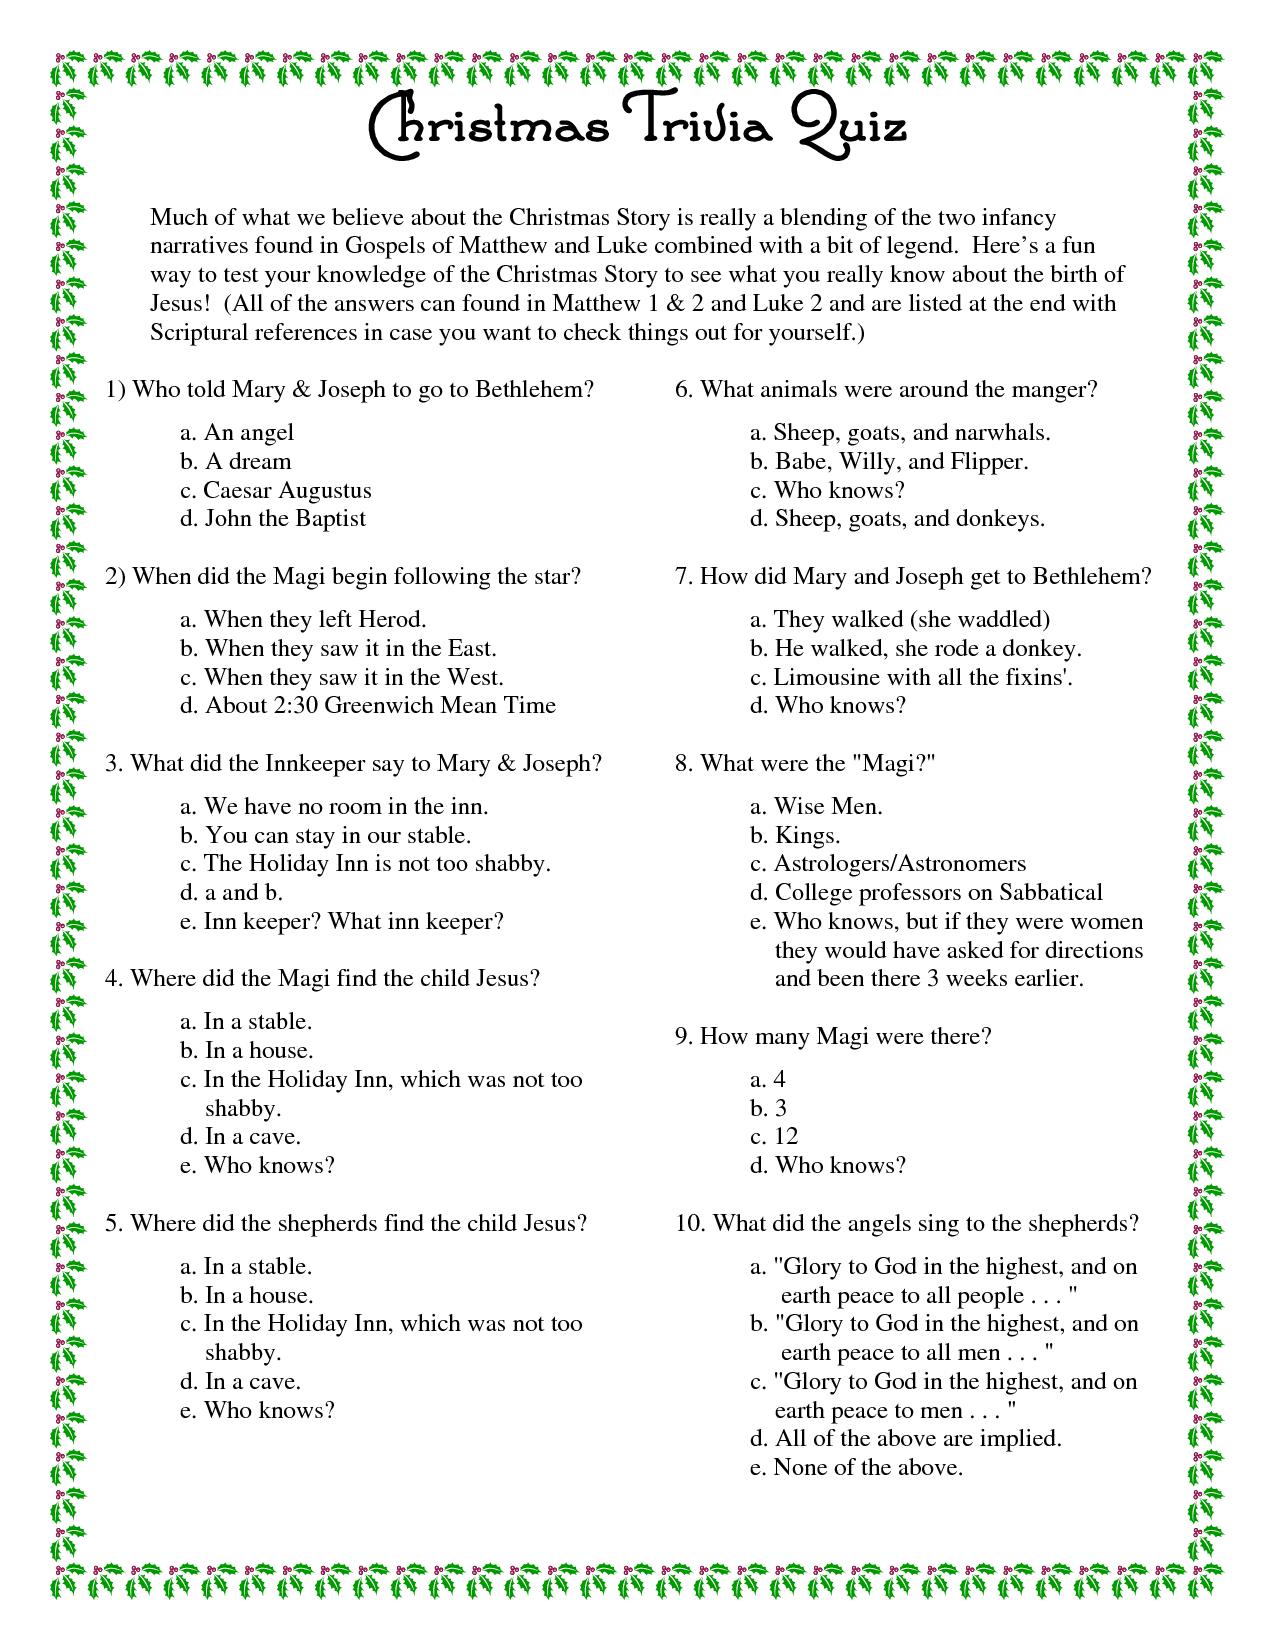 Printable+Christmas+Trivia+Questions+And+Answers | Christmas - Free Printable Christmas Trivia Quiz